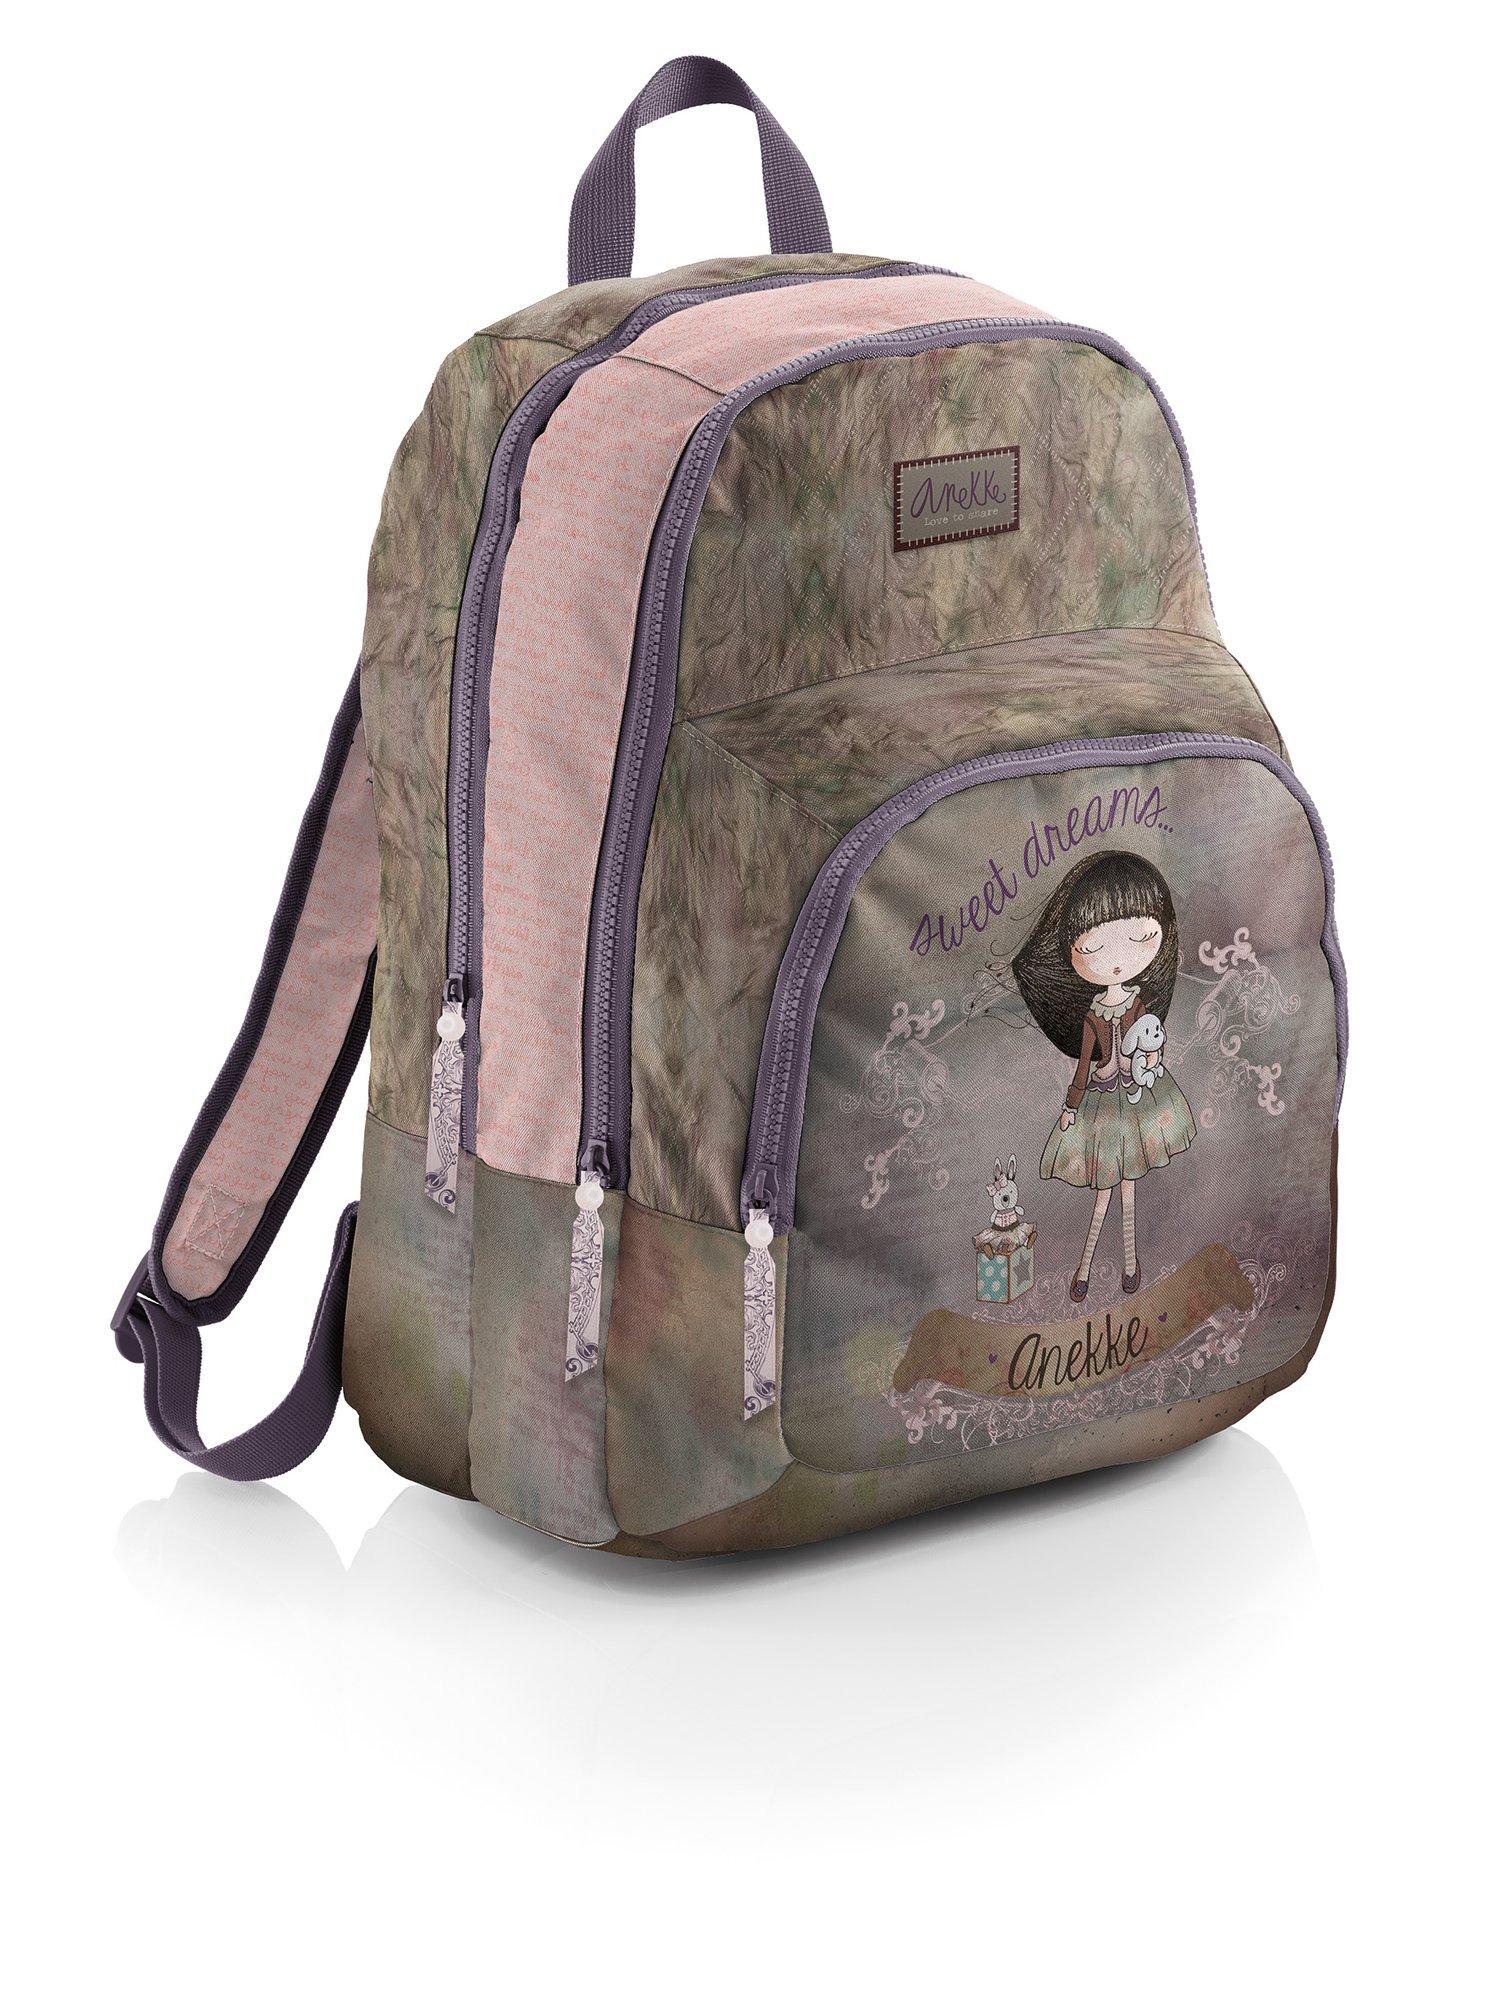 Sweet 12 Liters, Anekke Schulrucksack//Backpack mit 2 Rei/ßverschlussf/ächern Sweet Mochila Tipo Casual 35 cm